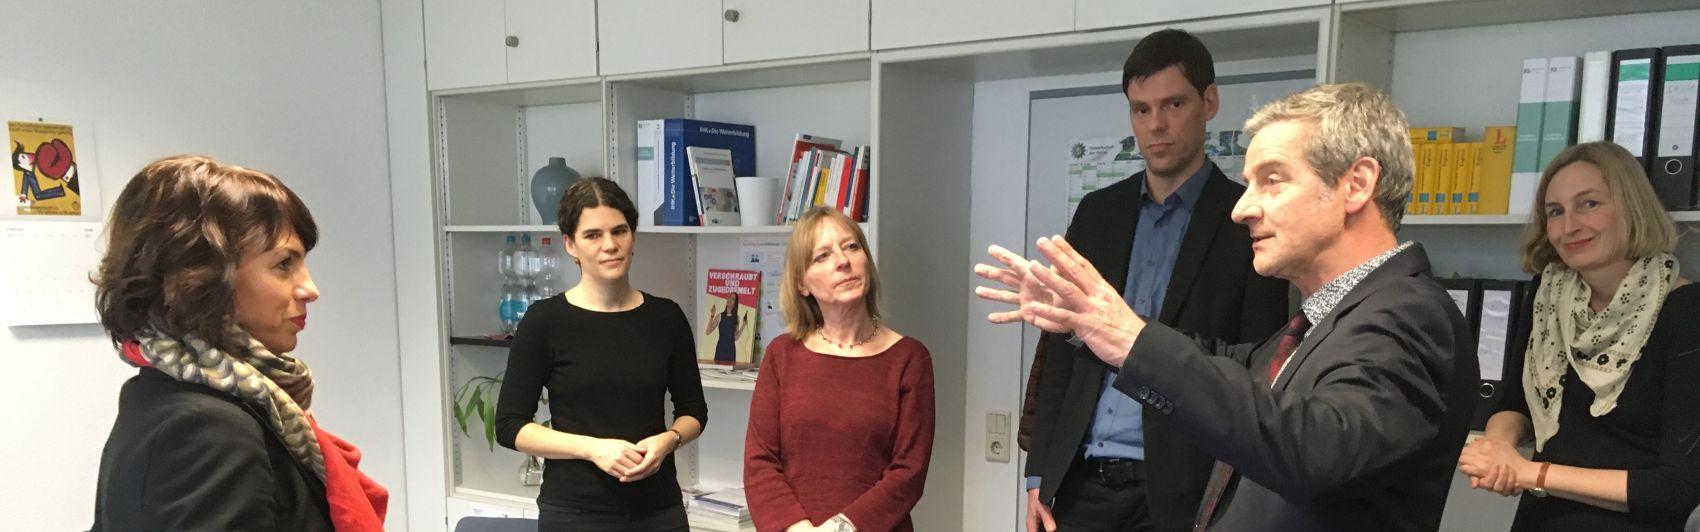 UVB-Geschäftsführer Eberhard Tomsche begrüßt Ministerin Susanna Karawanskij